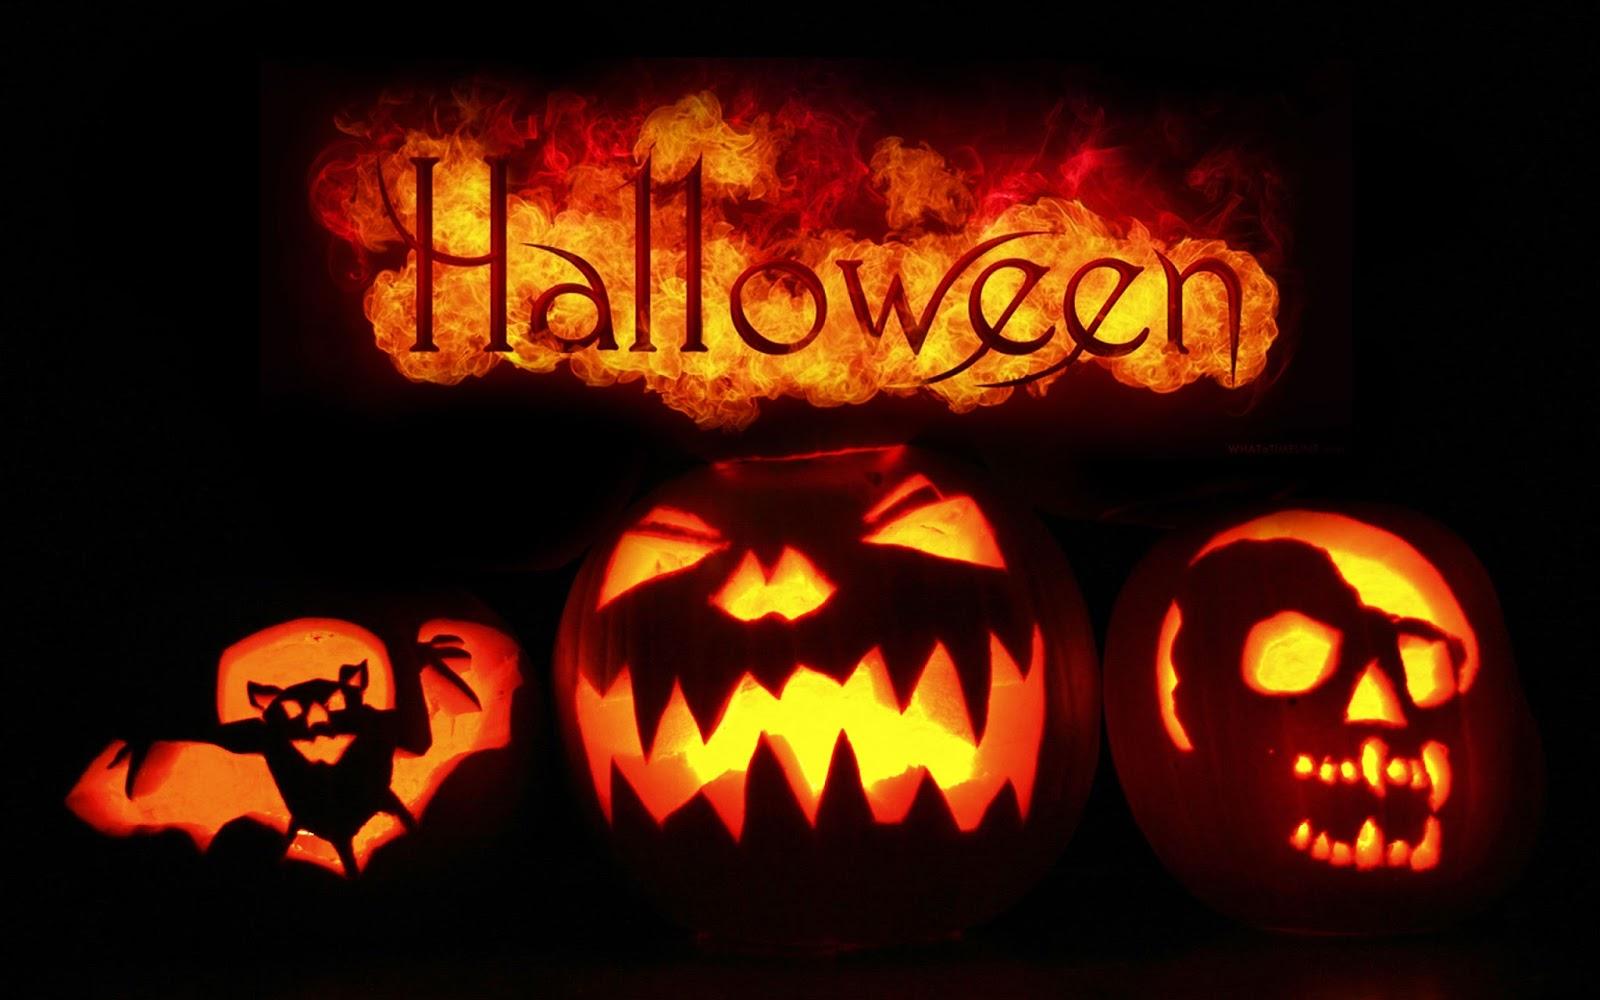 Great Wallpaper Halloween Iphone 5 - Happy-halloween-hd-wallpaper-iphone-6-plus-5-5c-ipad-2-13  Perfect Image Reference_542548.jpg